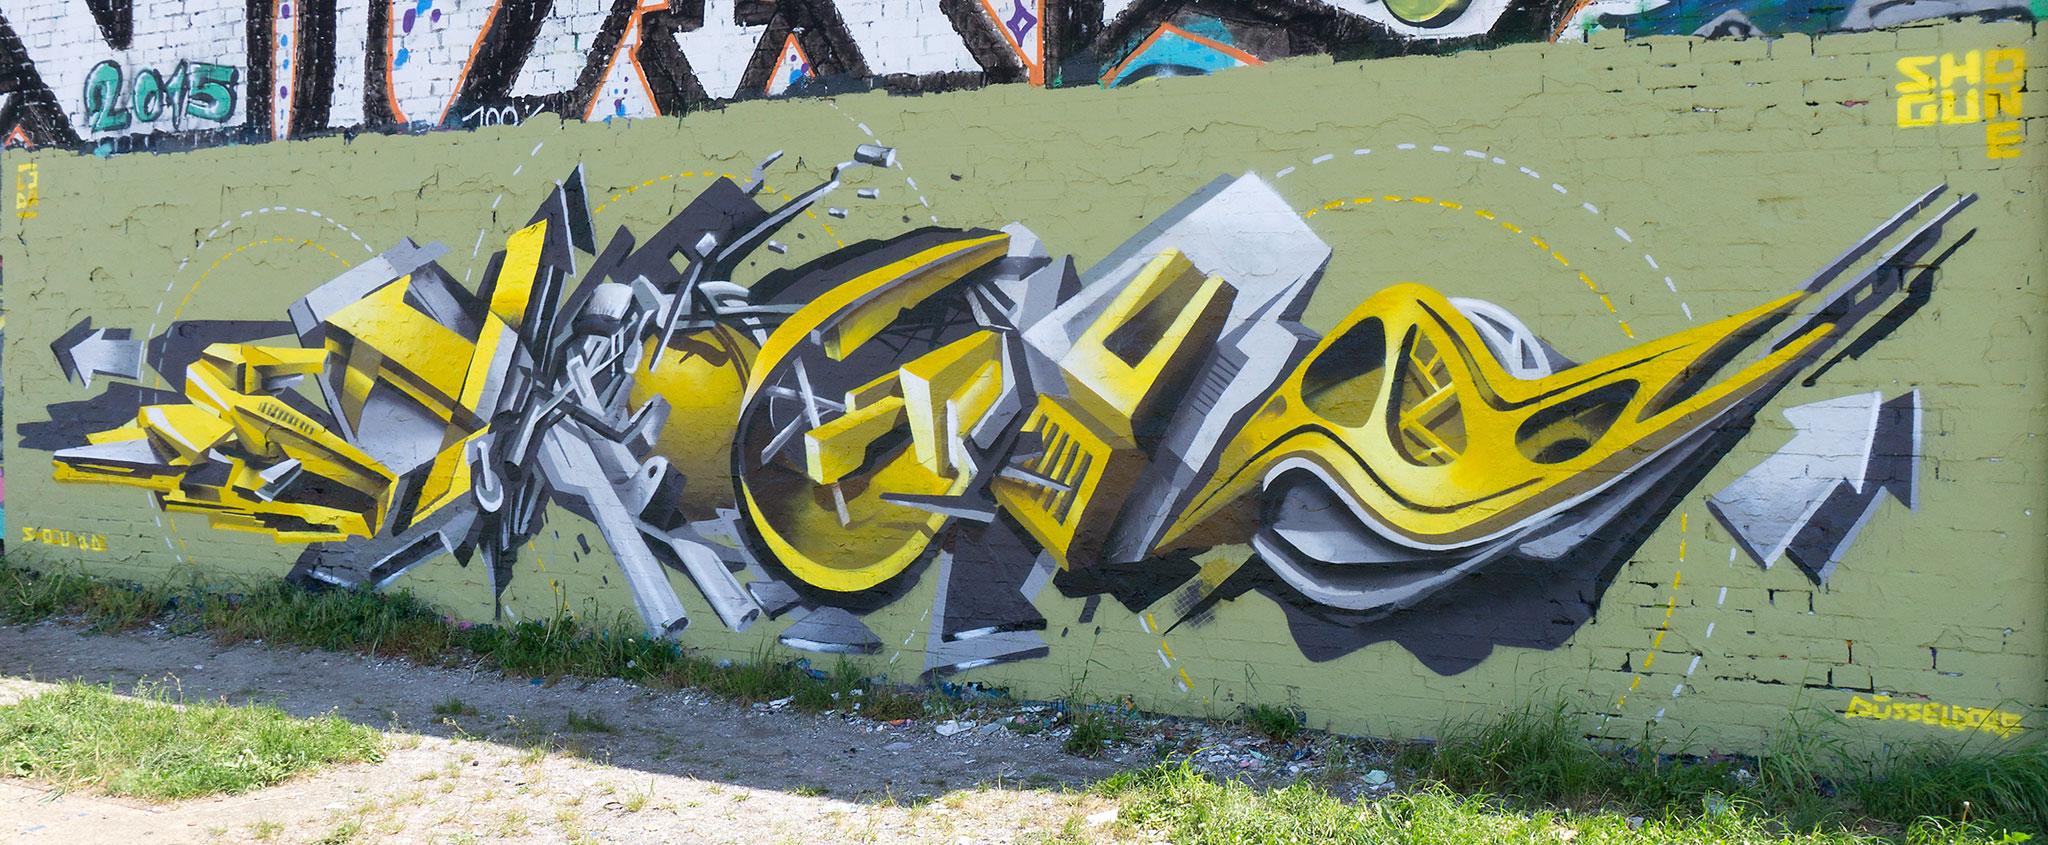 shogun_one_graffiti_luebeck_2016_3